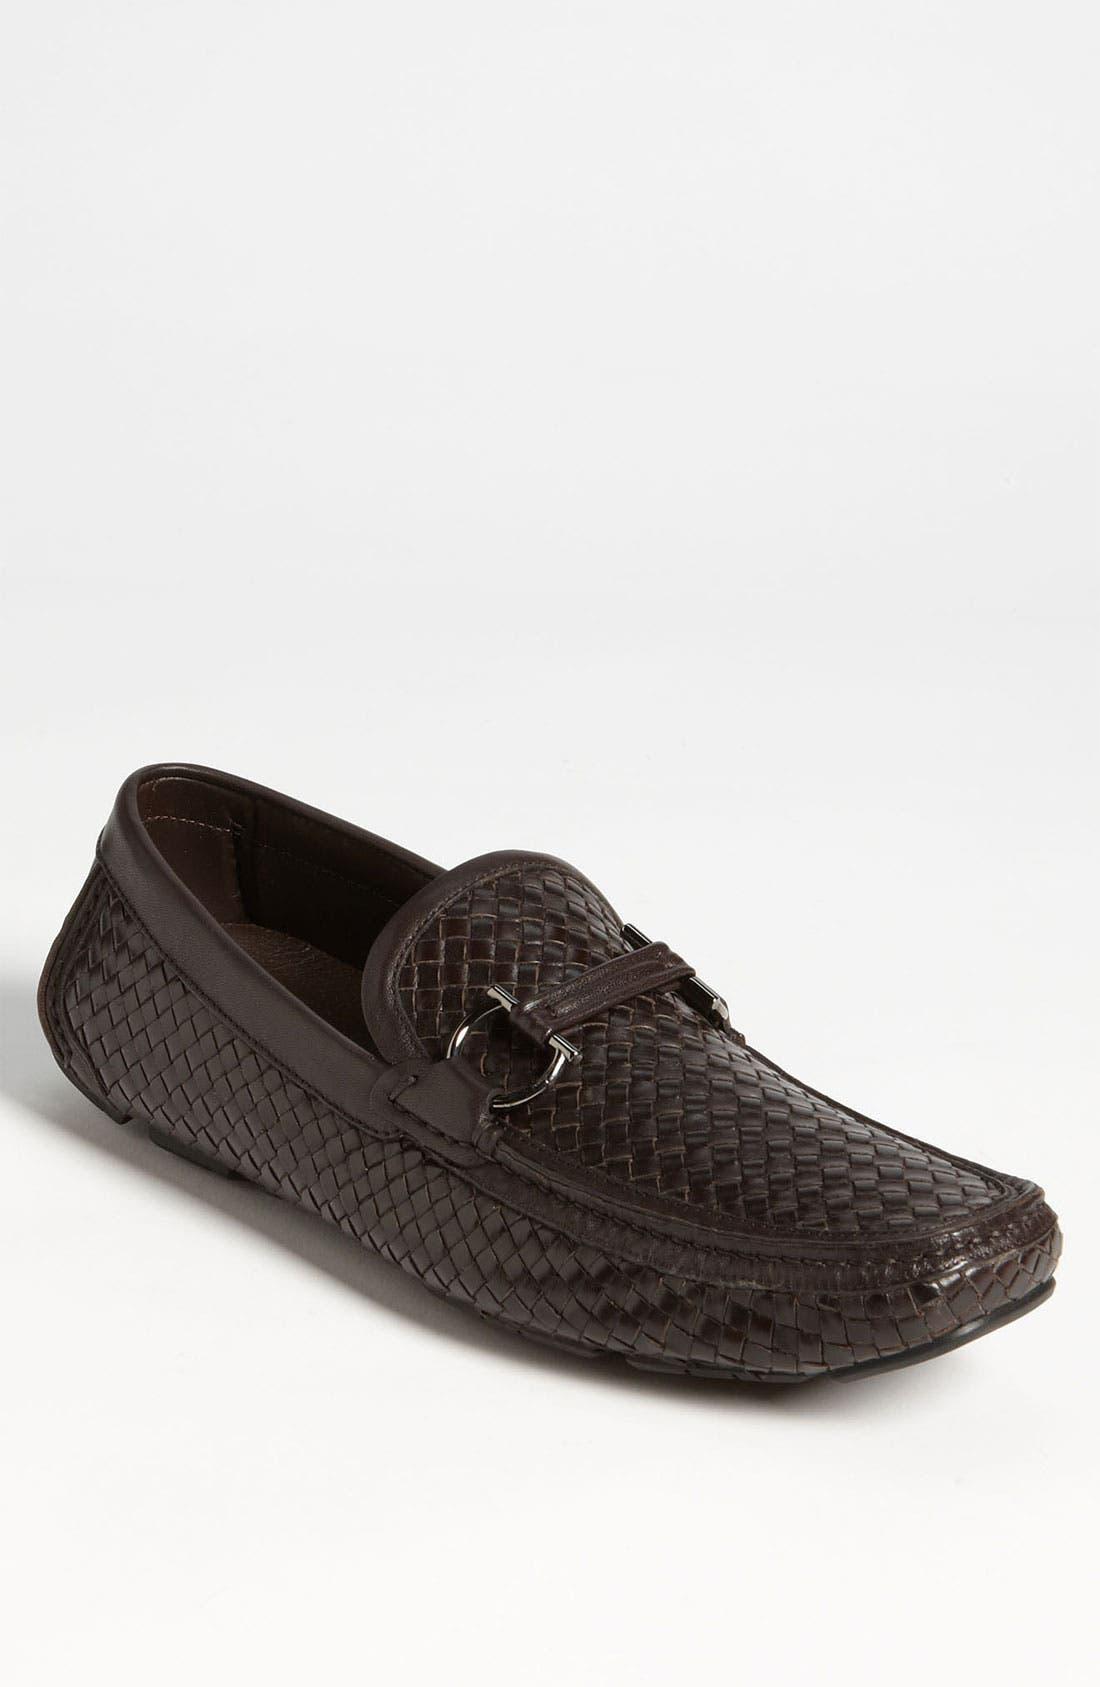 Alternate Image 1 Selected - Salvatore Ferragamo 'Barbados' Loafer